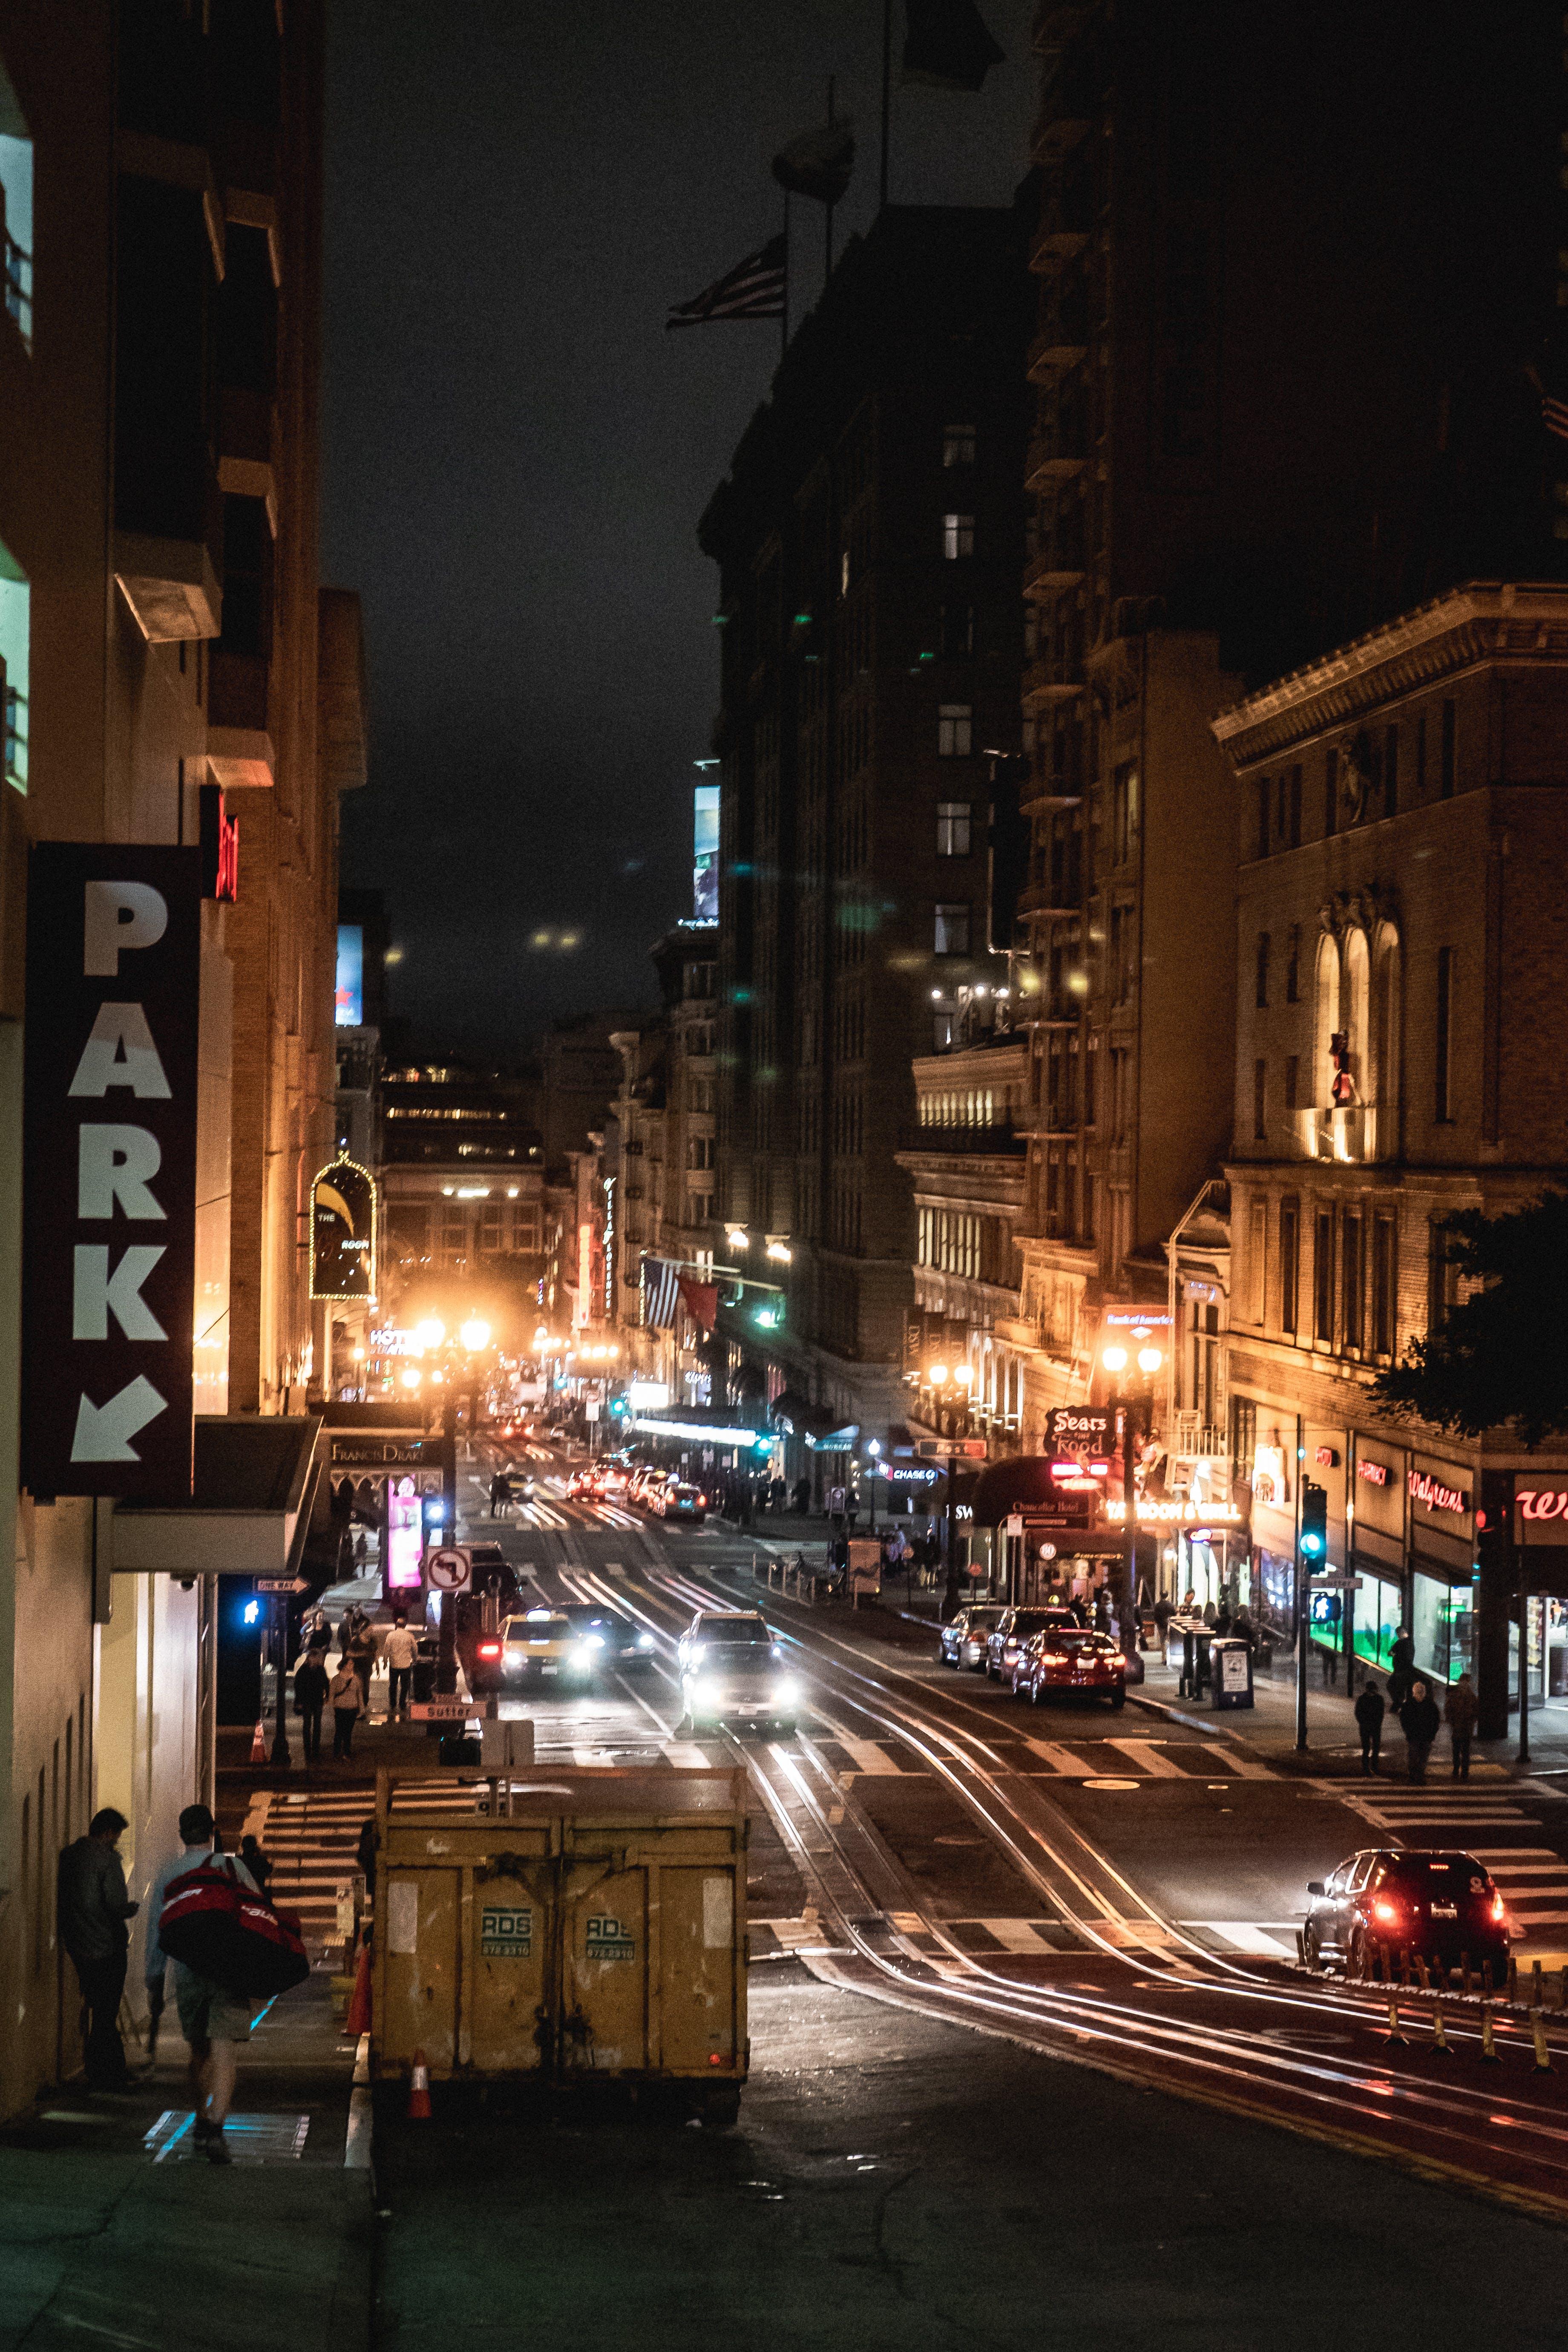 City Lights on Street